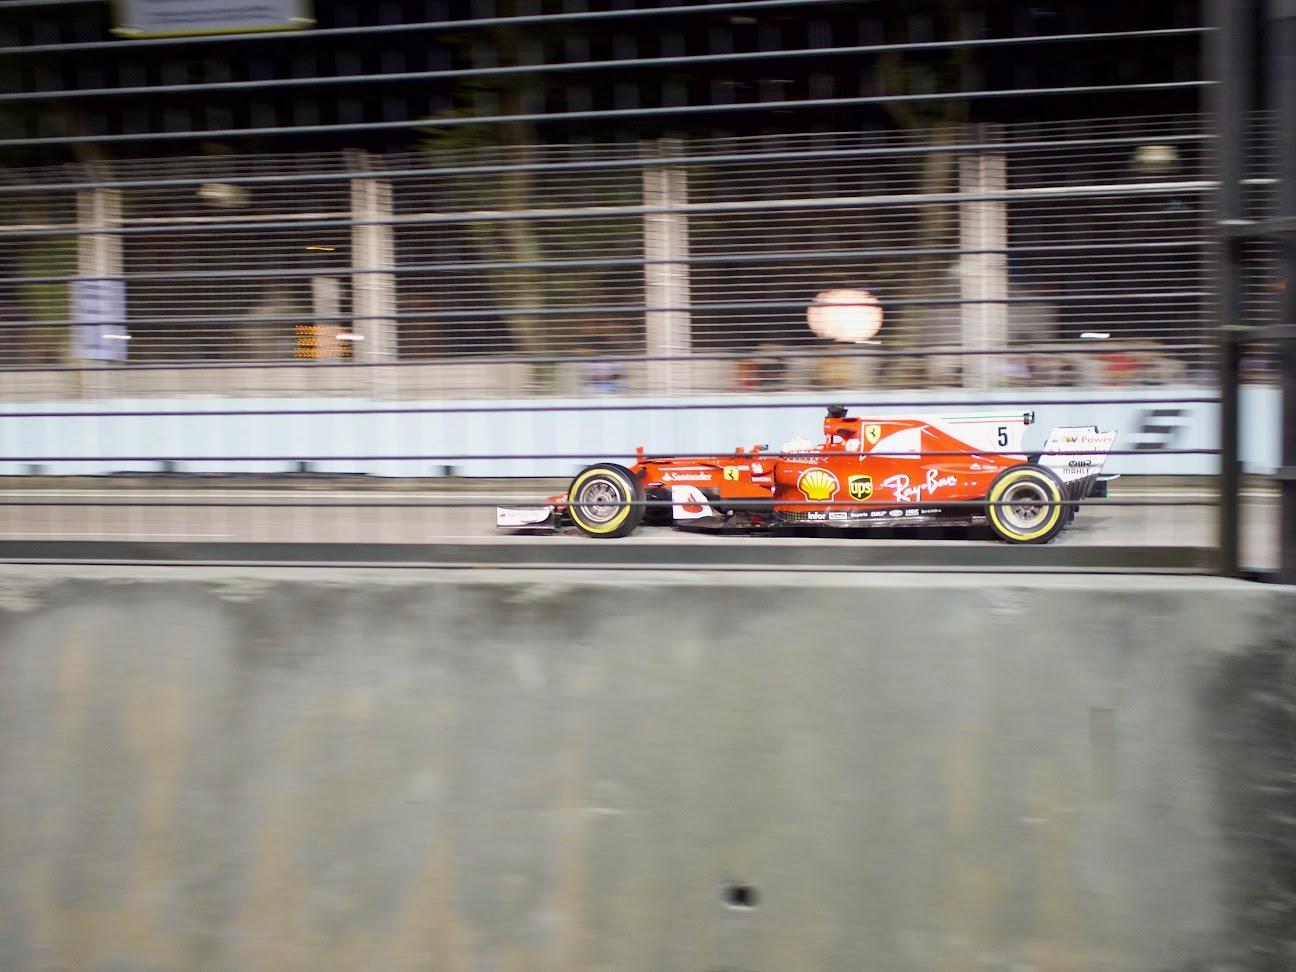 Singapore GP 2017 Practice 2